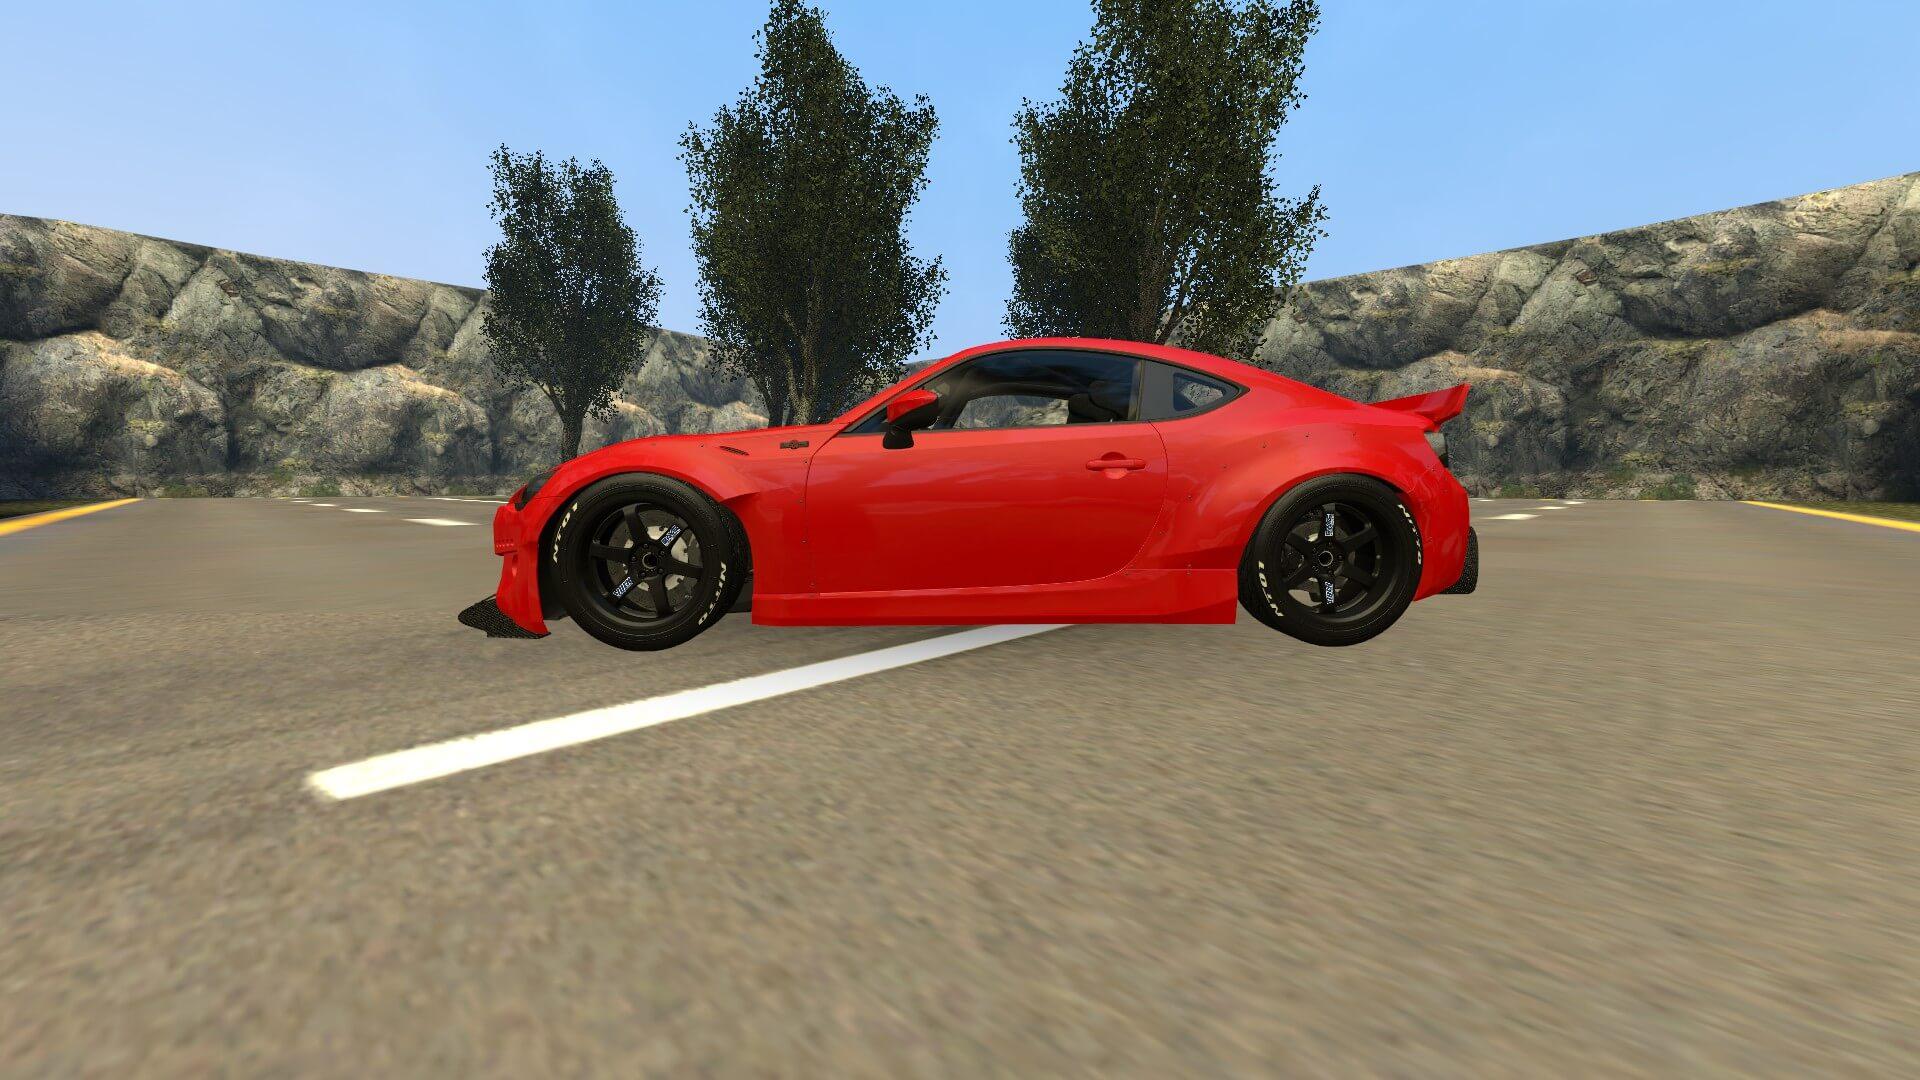 Garry's Mod 13 - 2015 Toyota GT-86 Rocket Bunny [Steel's Cars]